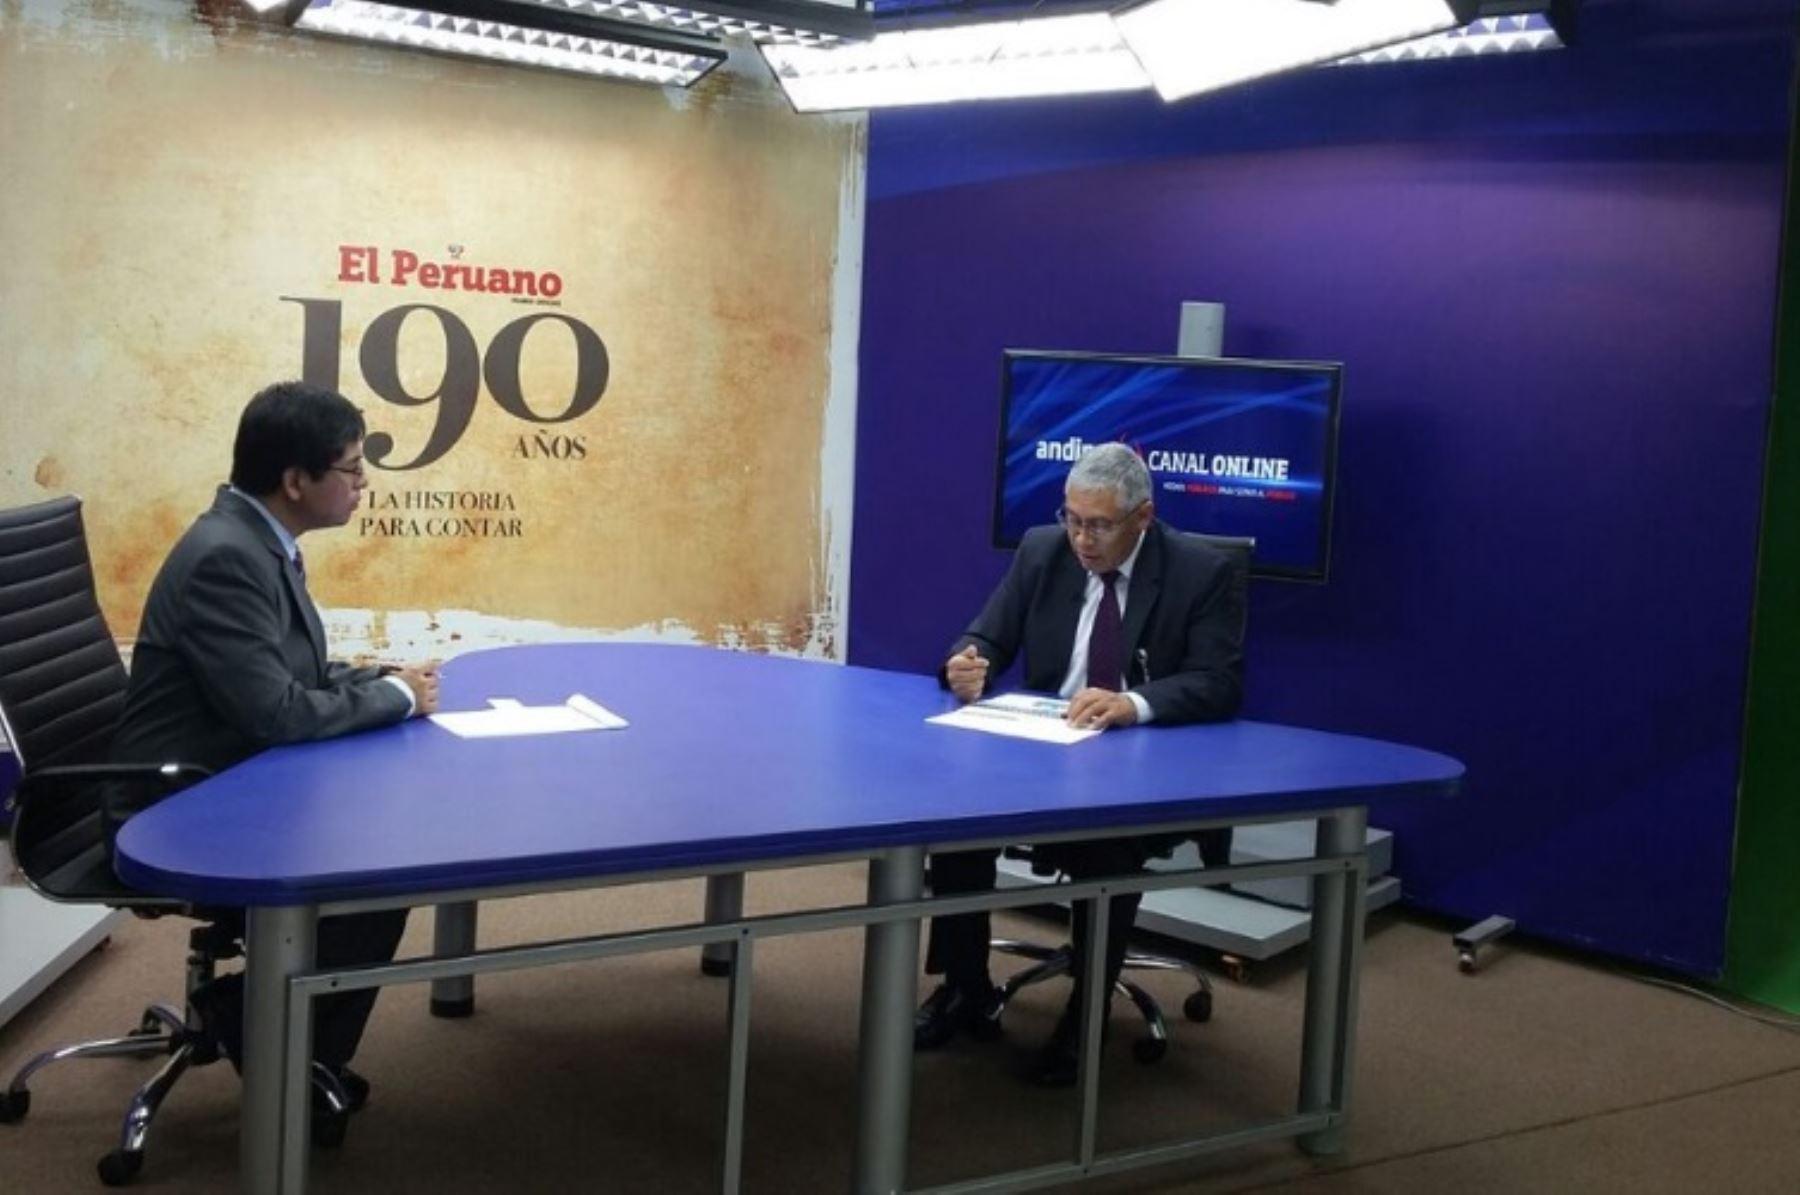 Gerente general de la ONPE, Gilbert Vallejos, se presenta en Andina Canal Online.